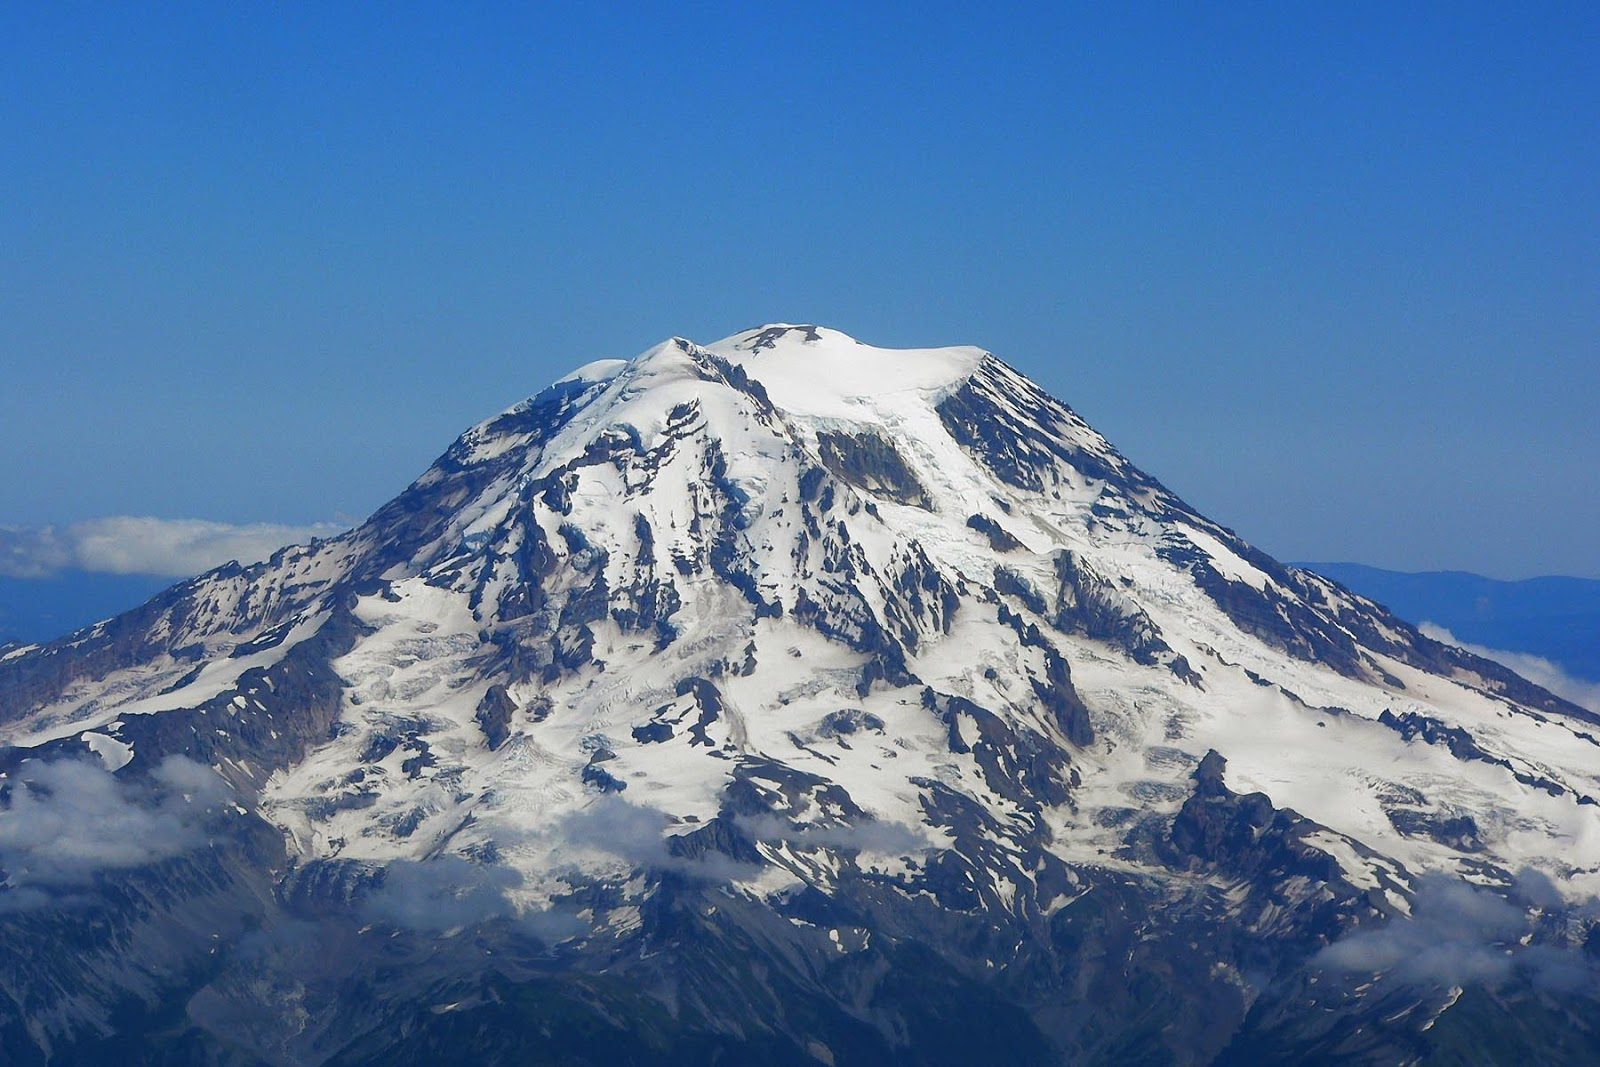 Travel Trip Journey: Mount Rainier Washington